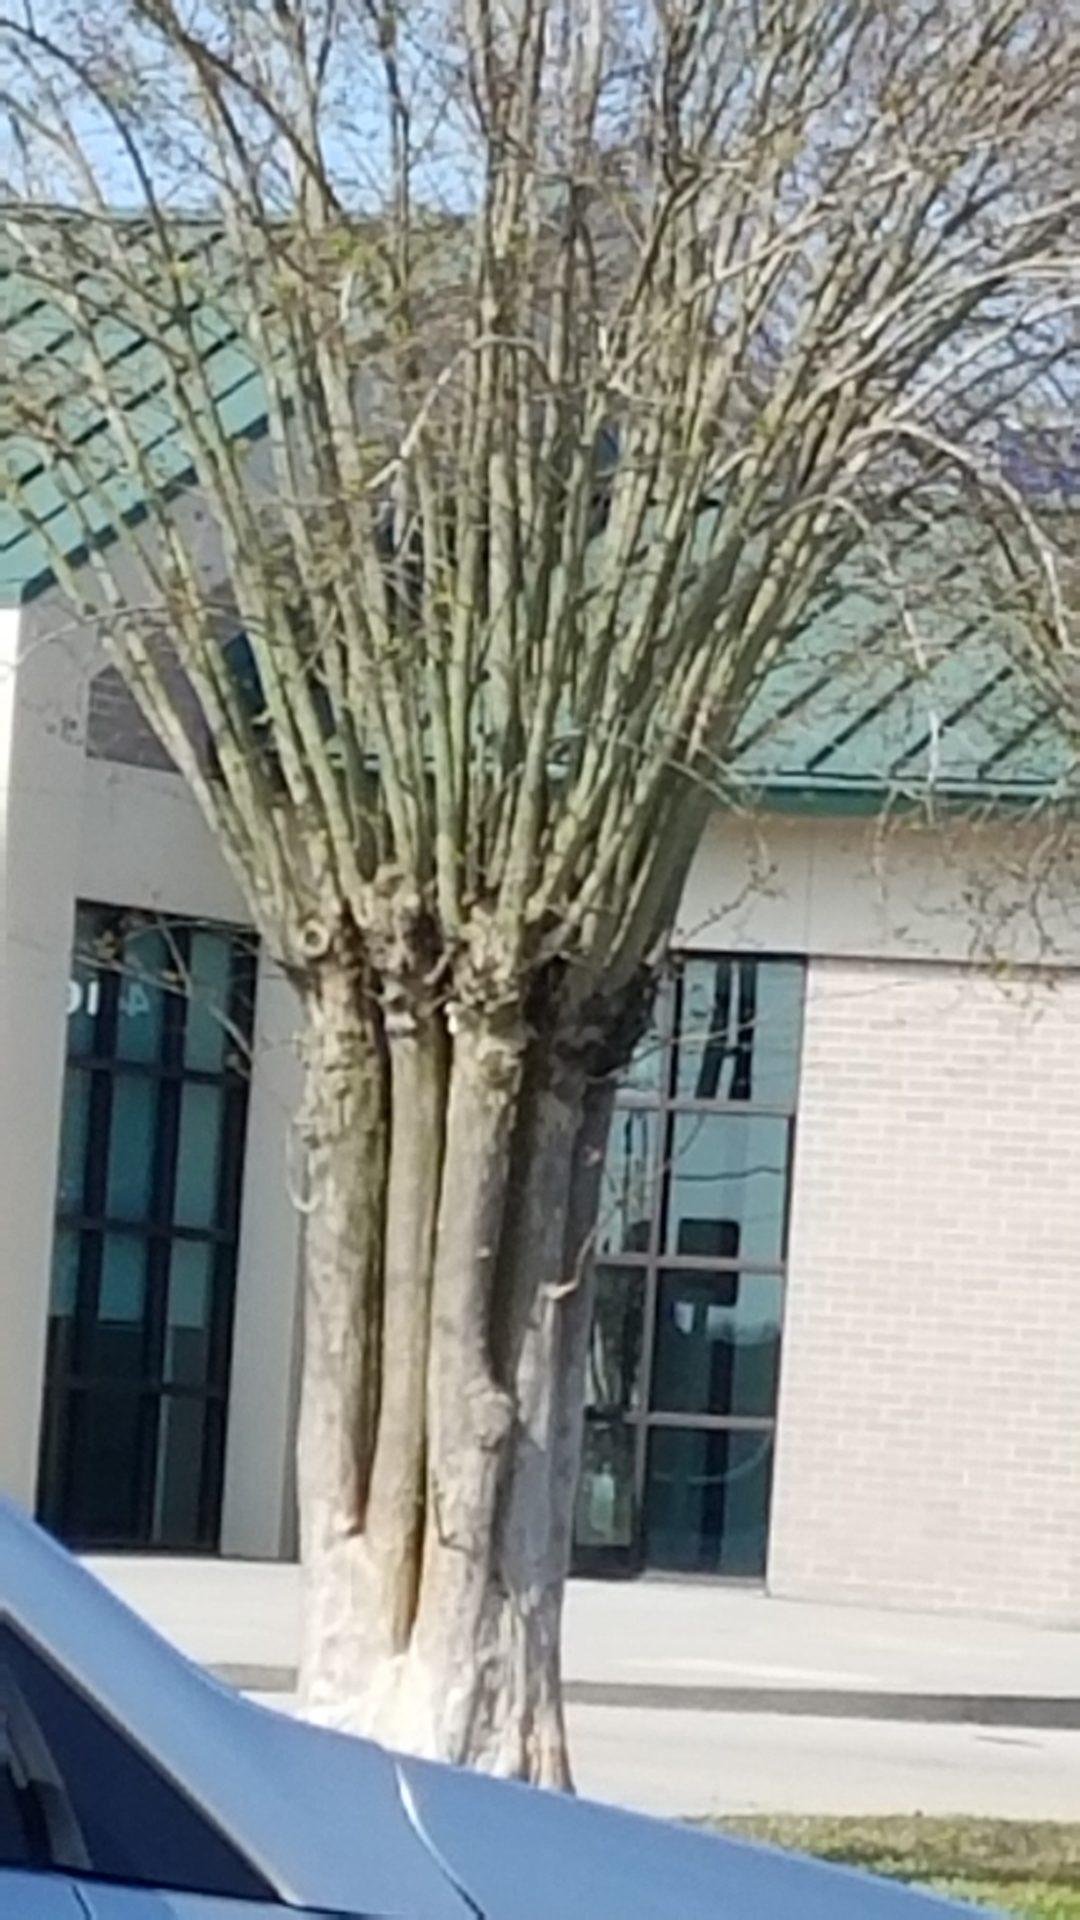 PLEASE STOP PLANTING CRAPE MYRTLES!!